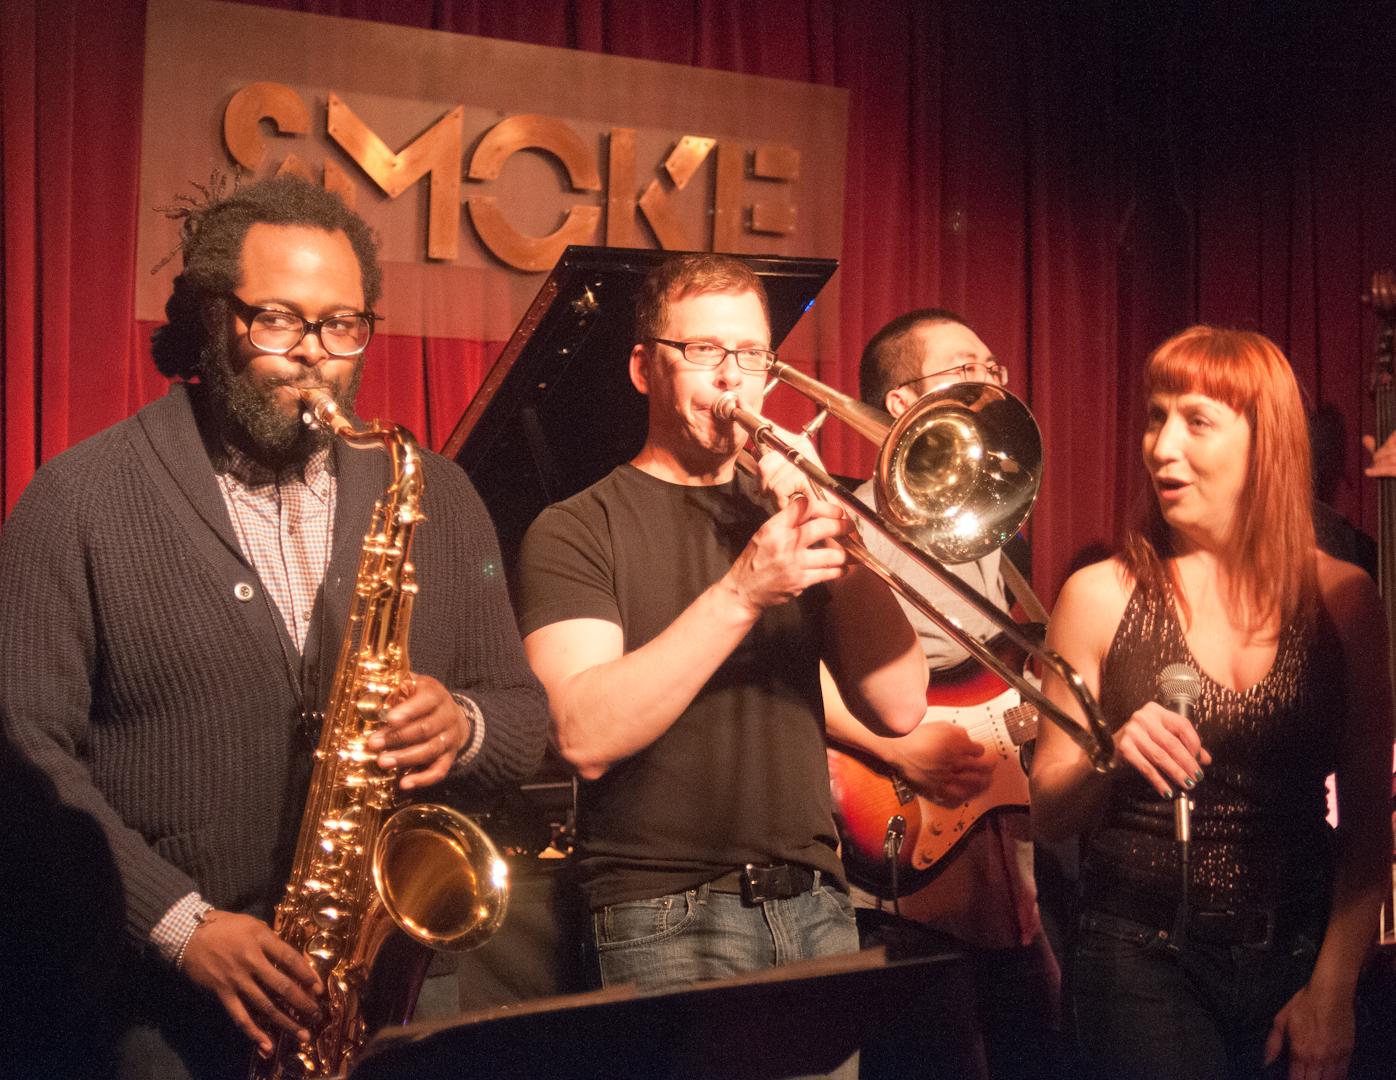 Jason Marshall, David Gibson, Victoria Cave and Mike Winnick AKA Nickel Killsmics with Nickle and Dime Ops at Smoke Jazz Club